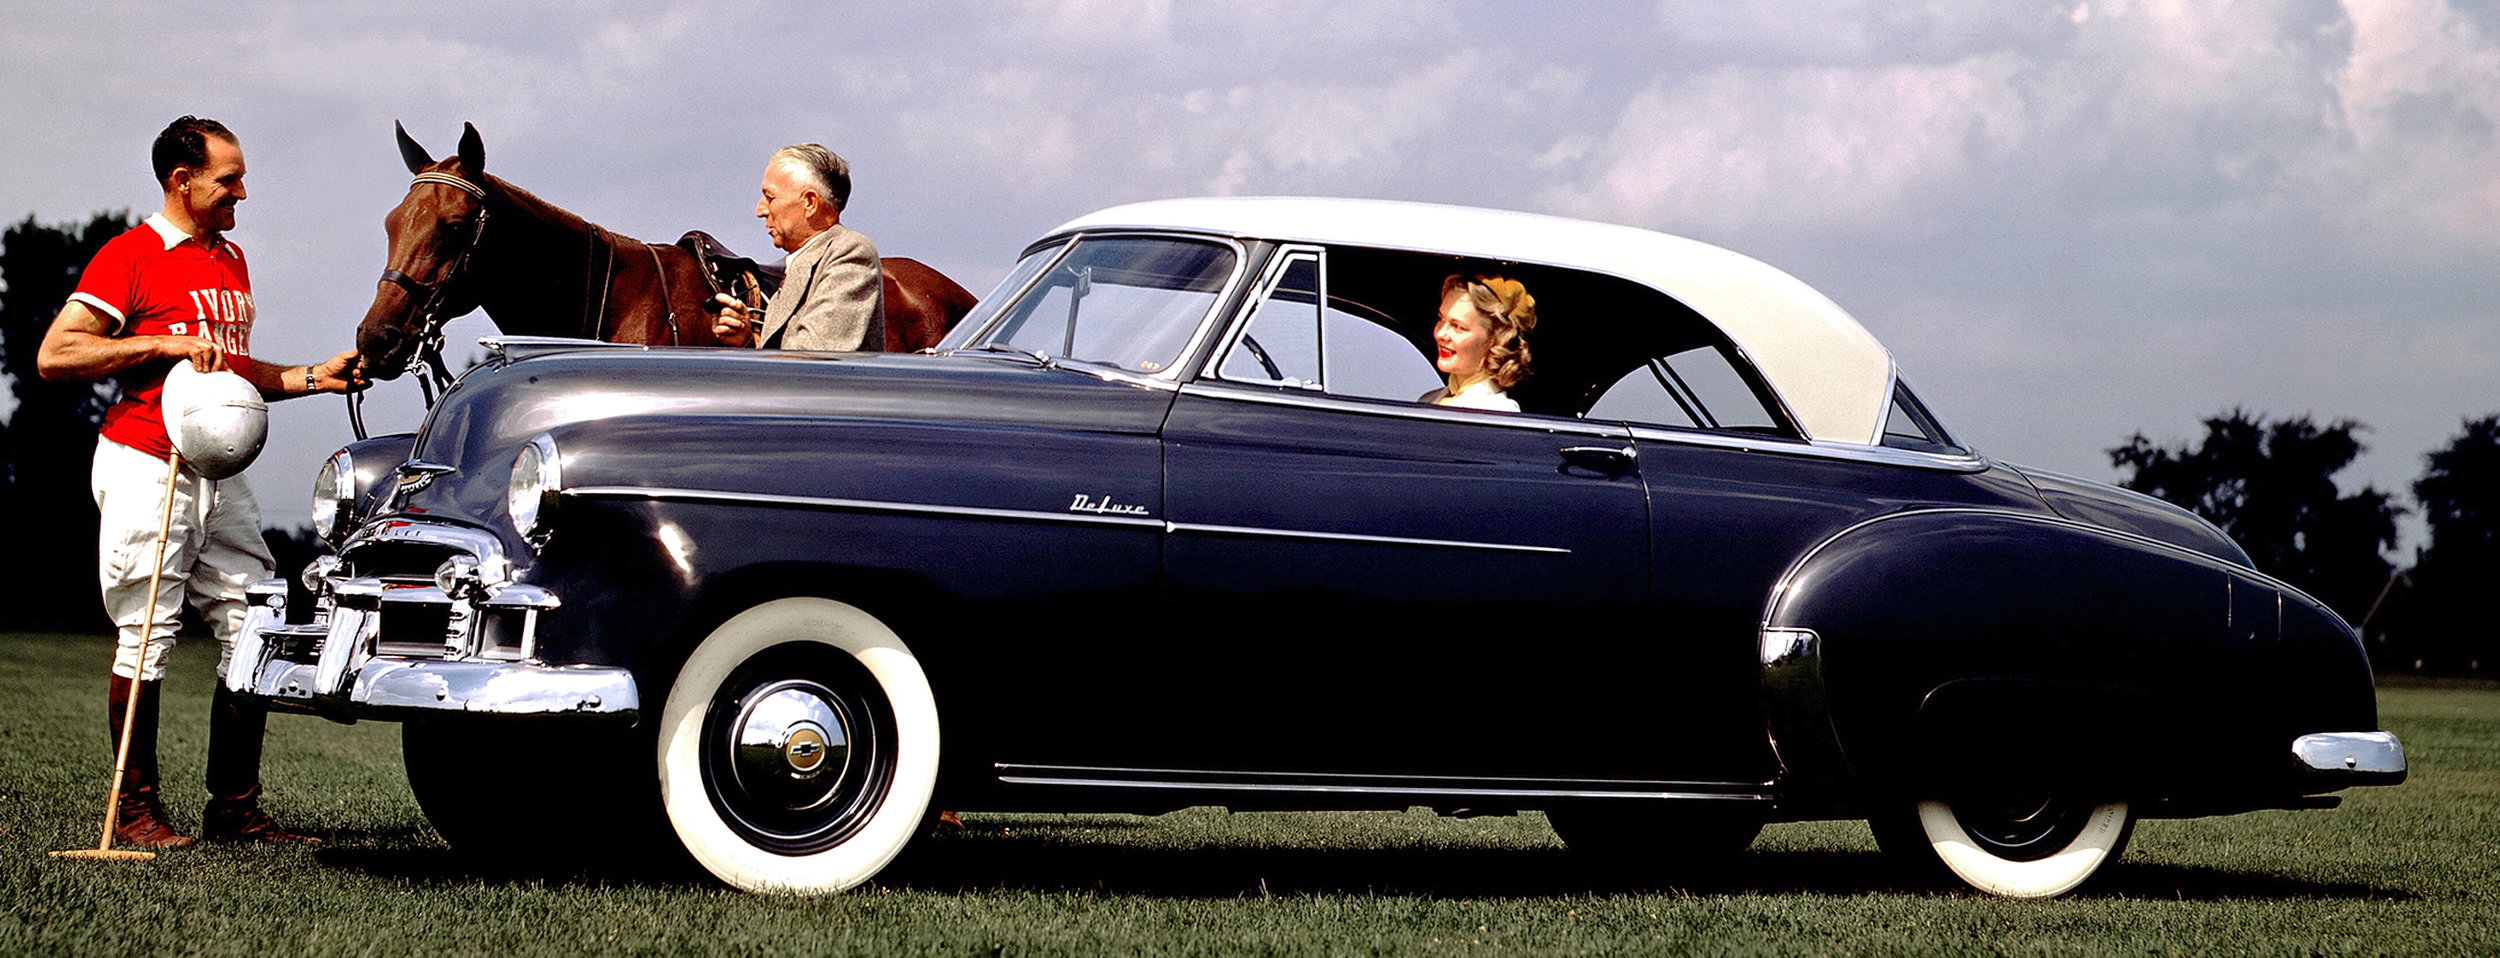 Chevrolet - 1950-1959